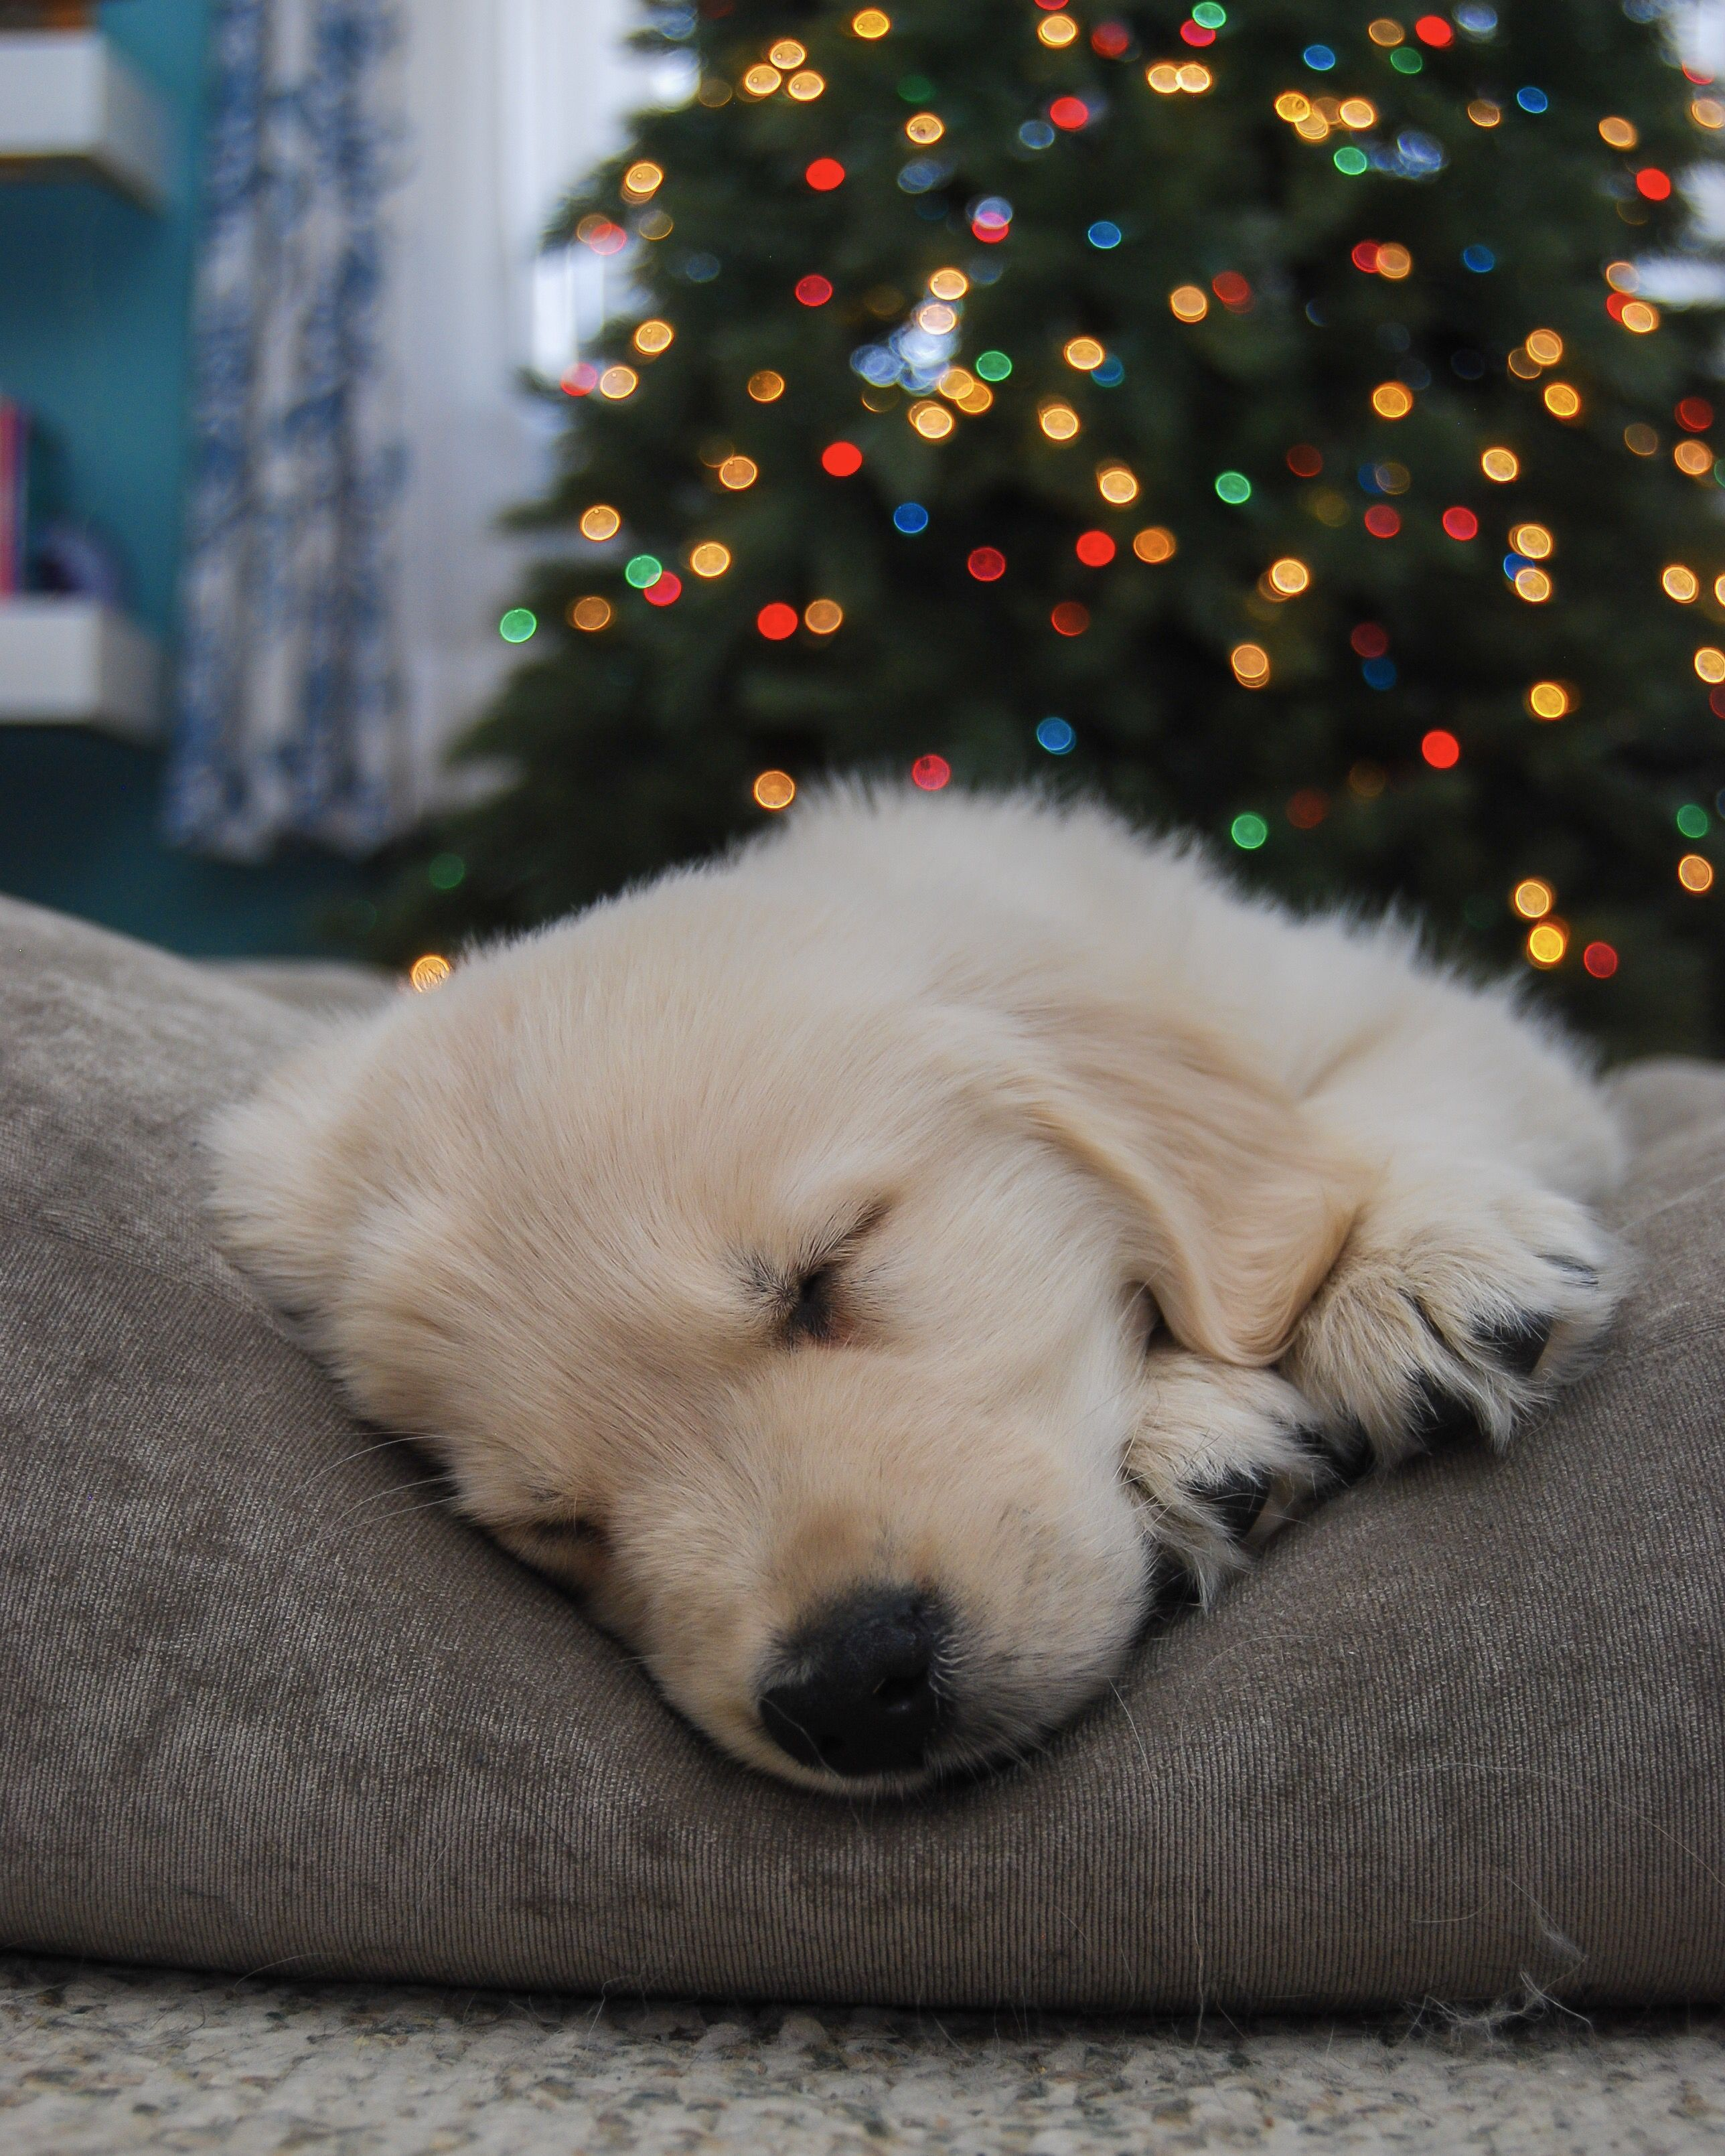 Beautiful 9 Week Old Golden Retriever Puppy Sleeping In Front Of